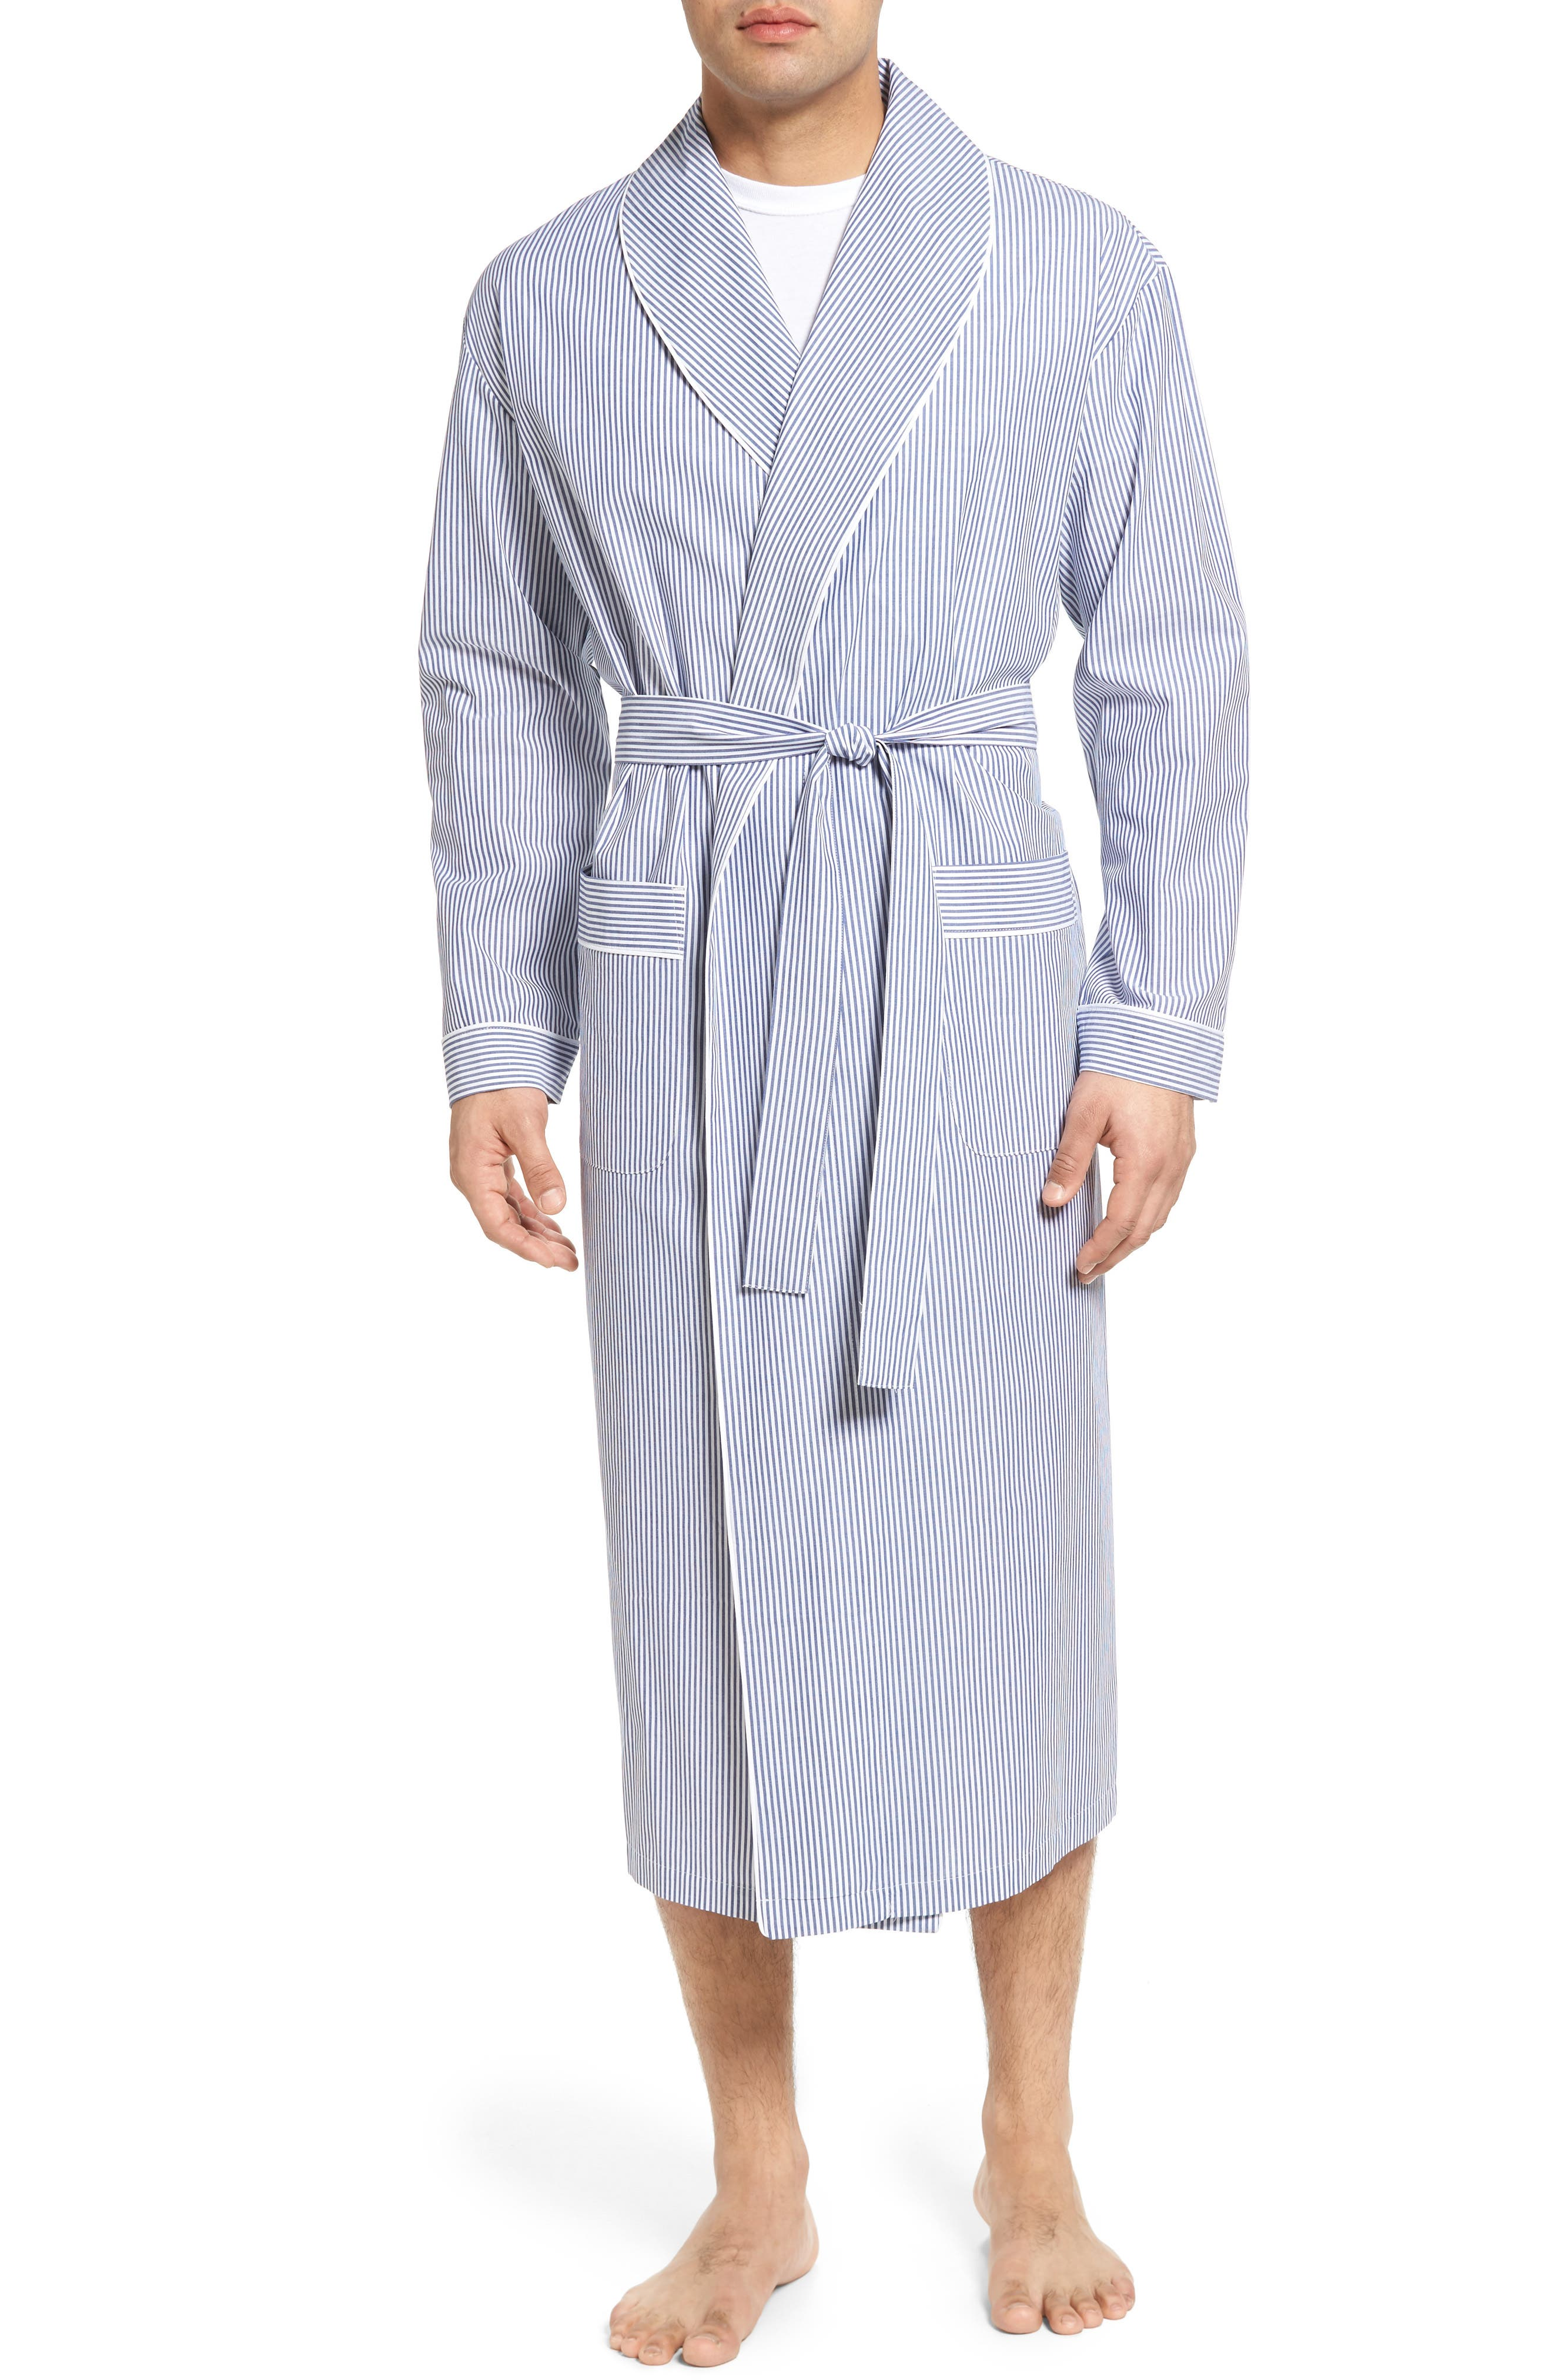 MAJESTIC INTERNATIONAL, Bengal Stripe Robe, Main thumbnail 1, color, NAVY/ WHITE